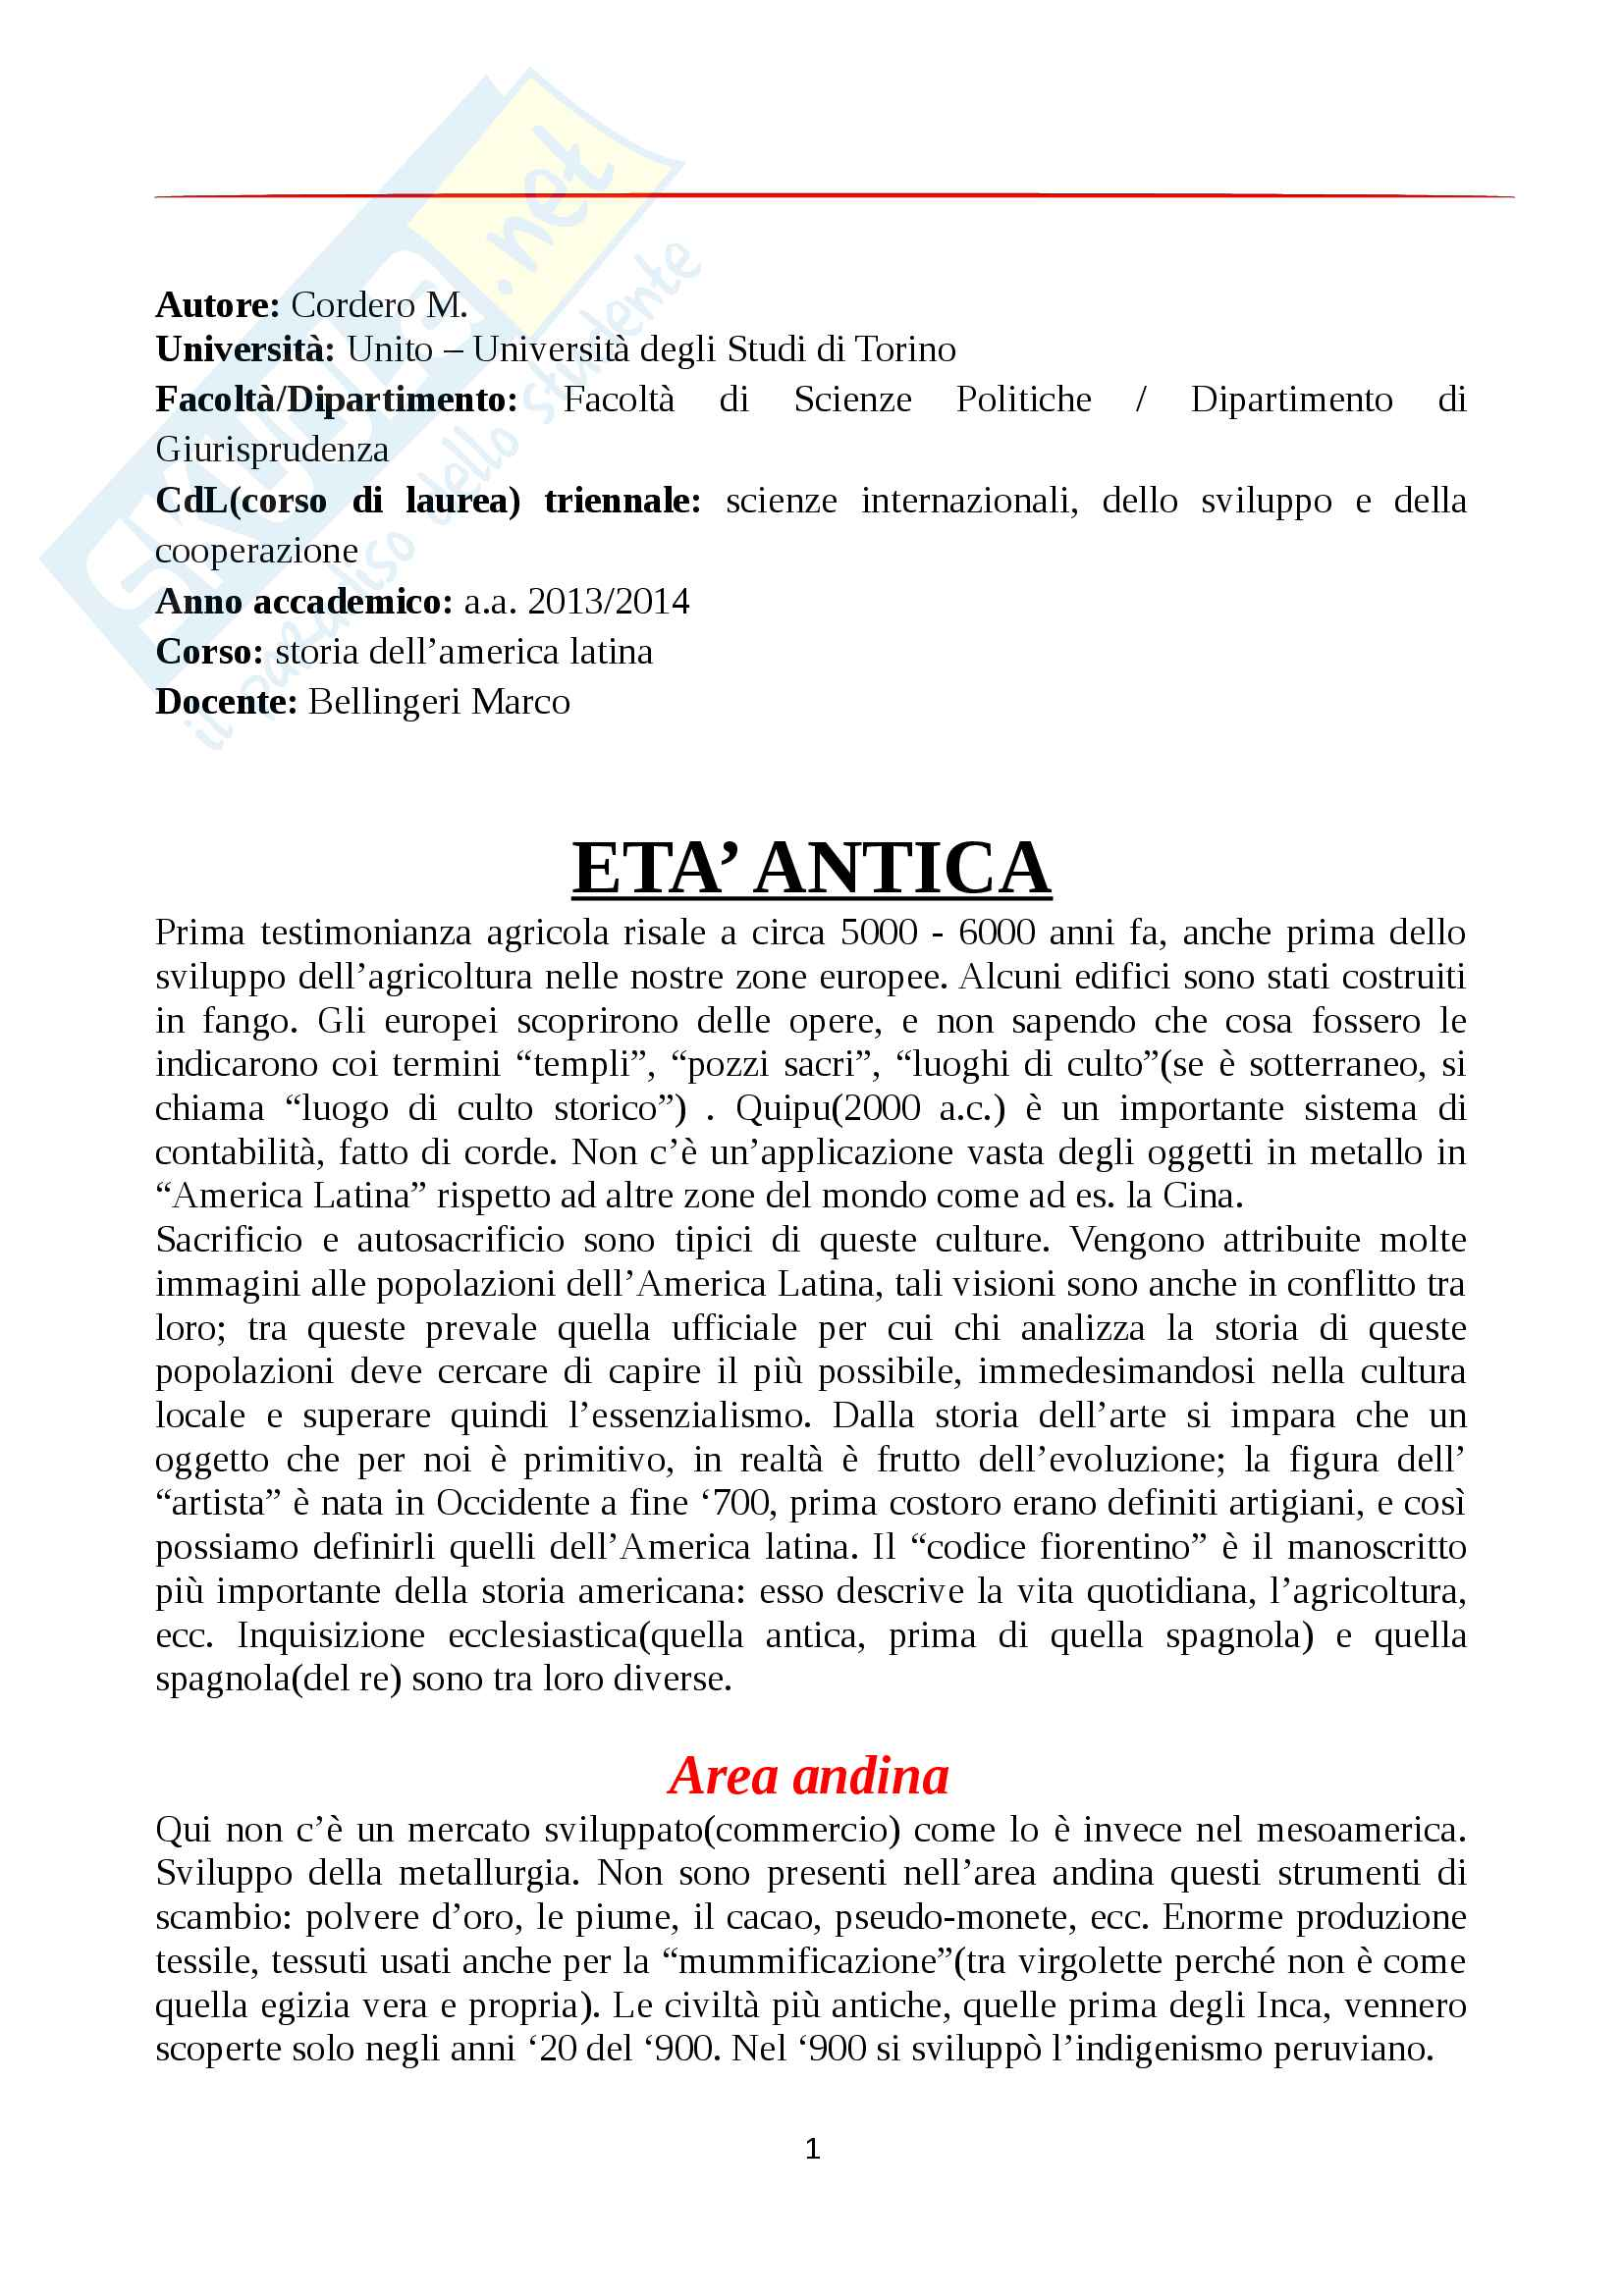 Storia dell'America latina - Prof. Bellingeri Marco - Appunti